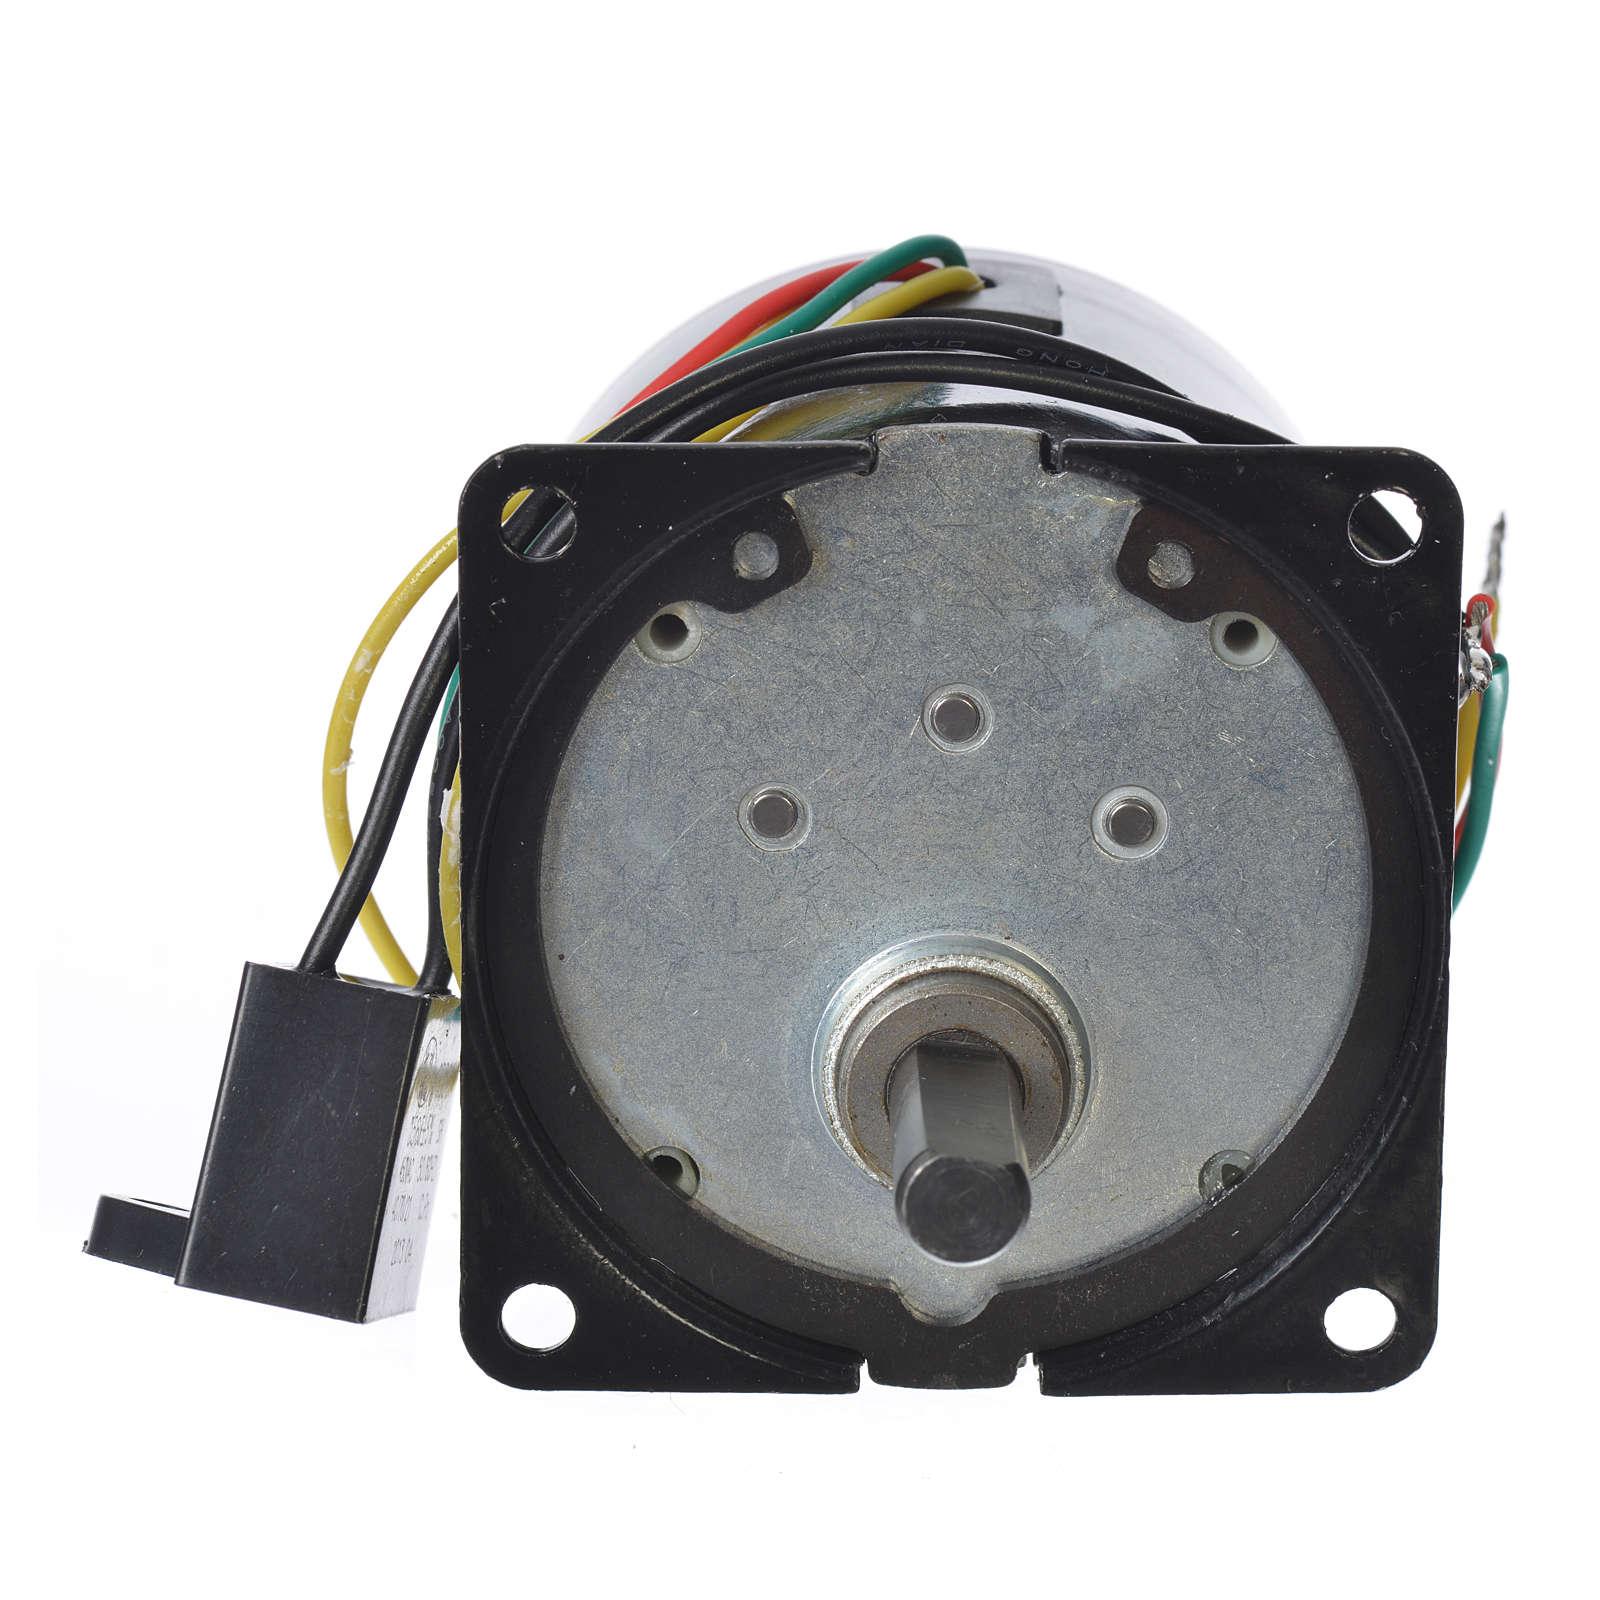 Motoriduttore MPW 2,5 giri/min presepe 4